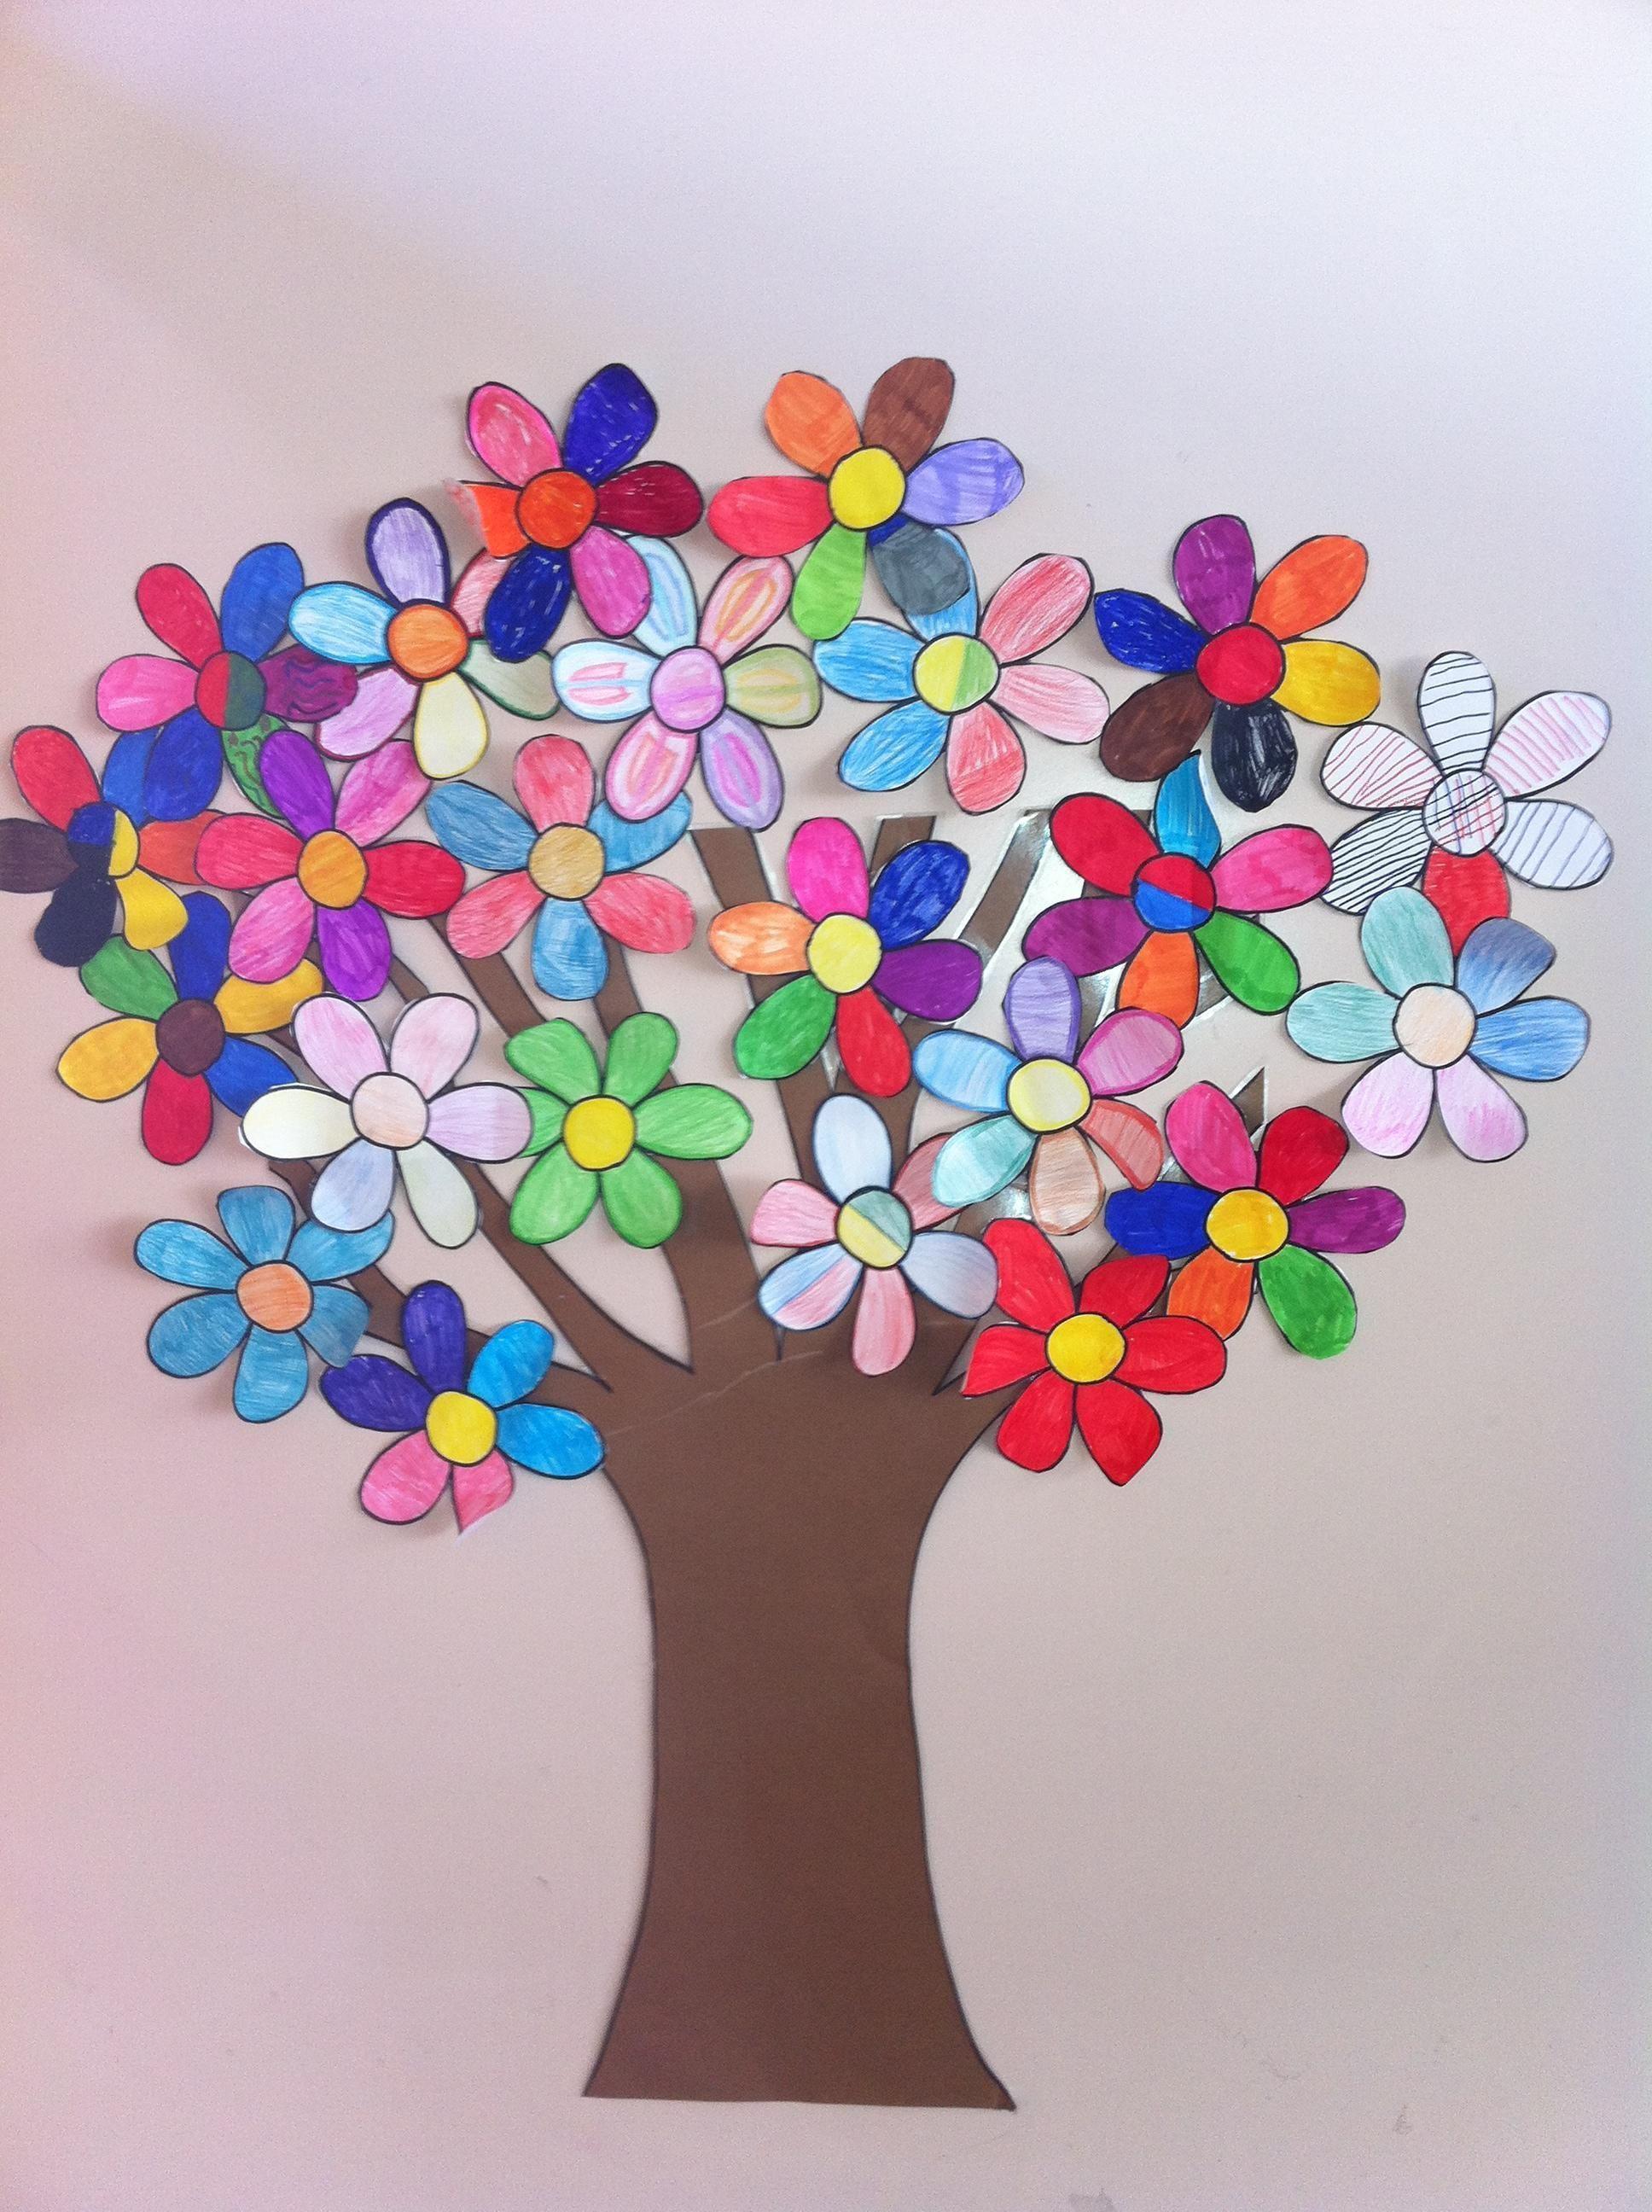 Como decorar un salon de verano un precioso rbol de for Manualidades decoracion infantil